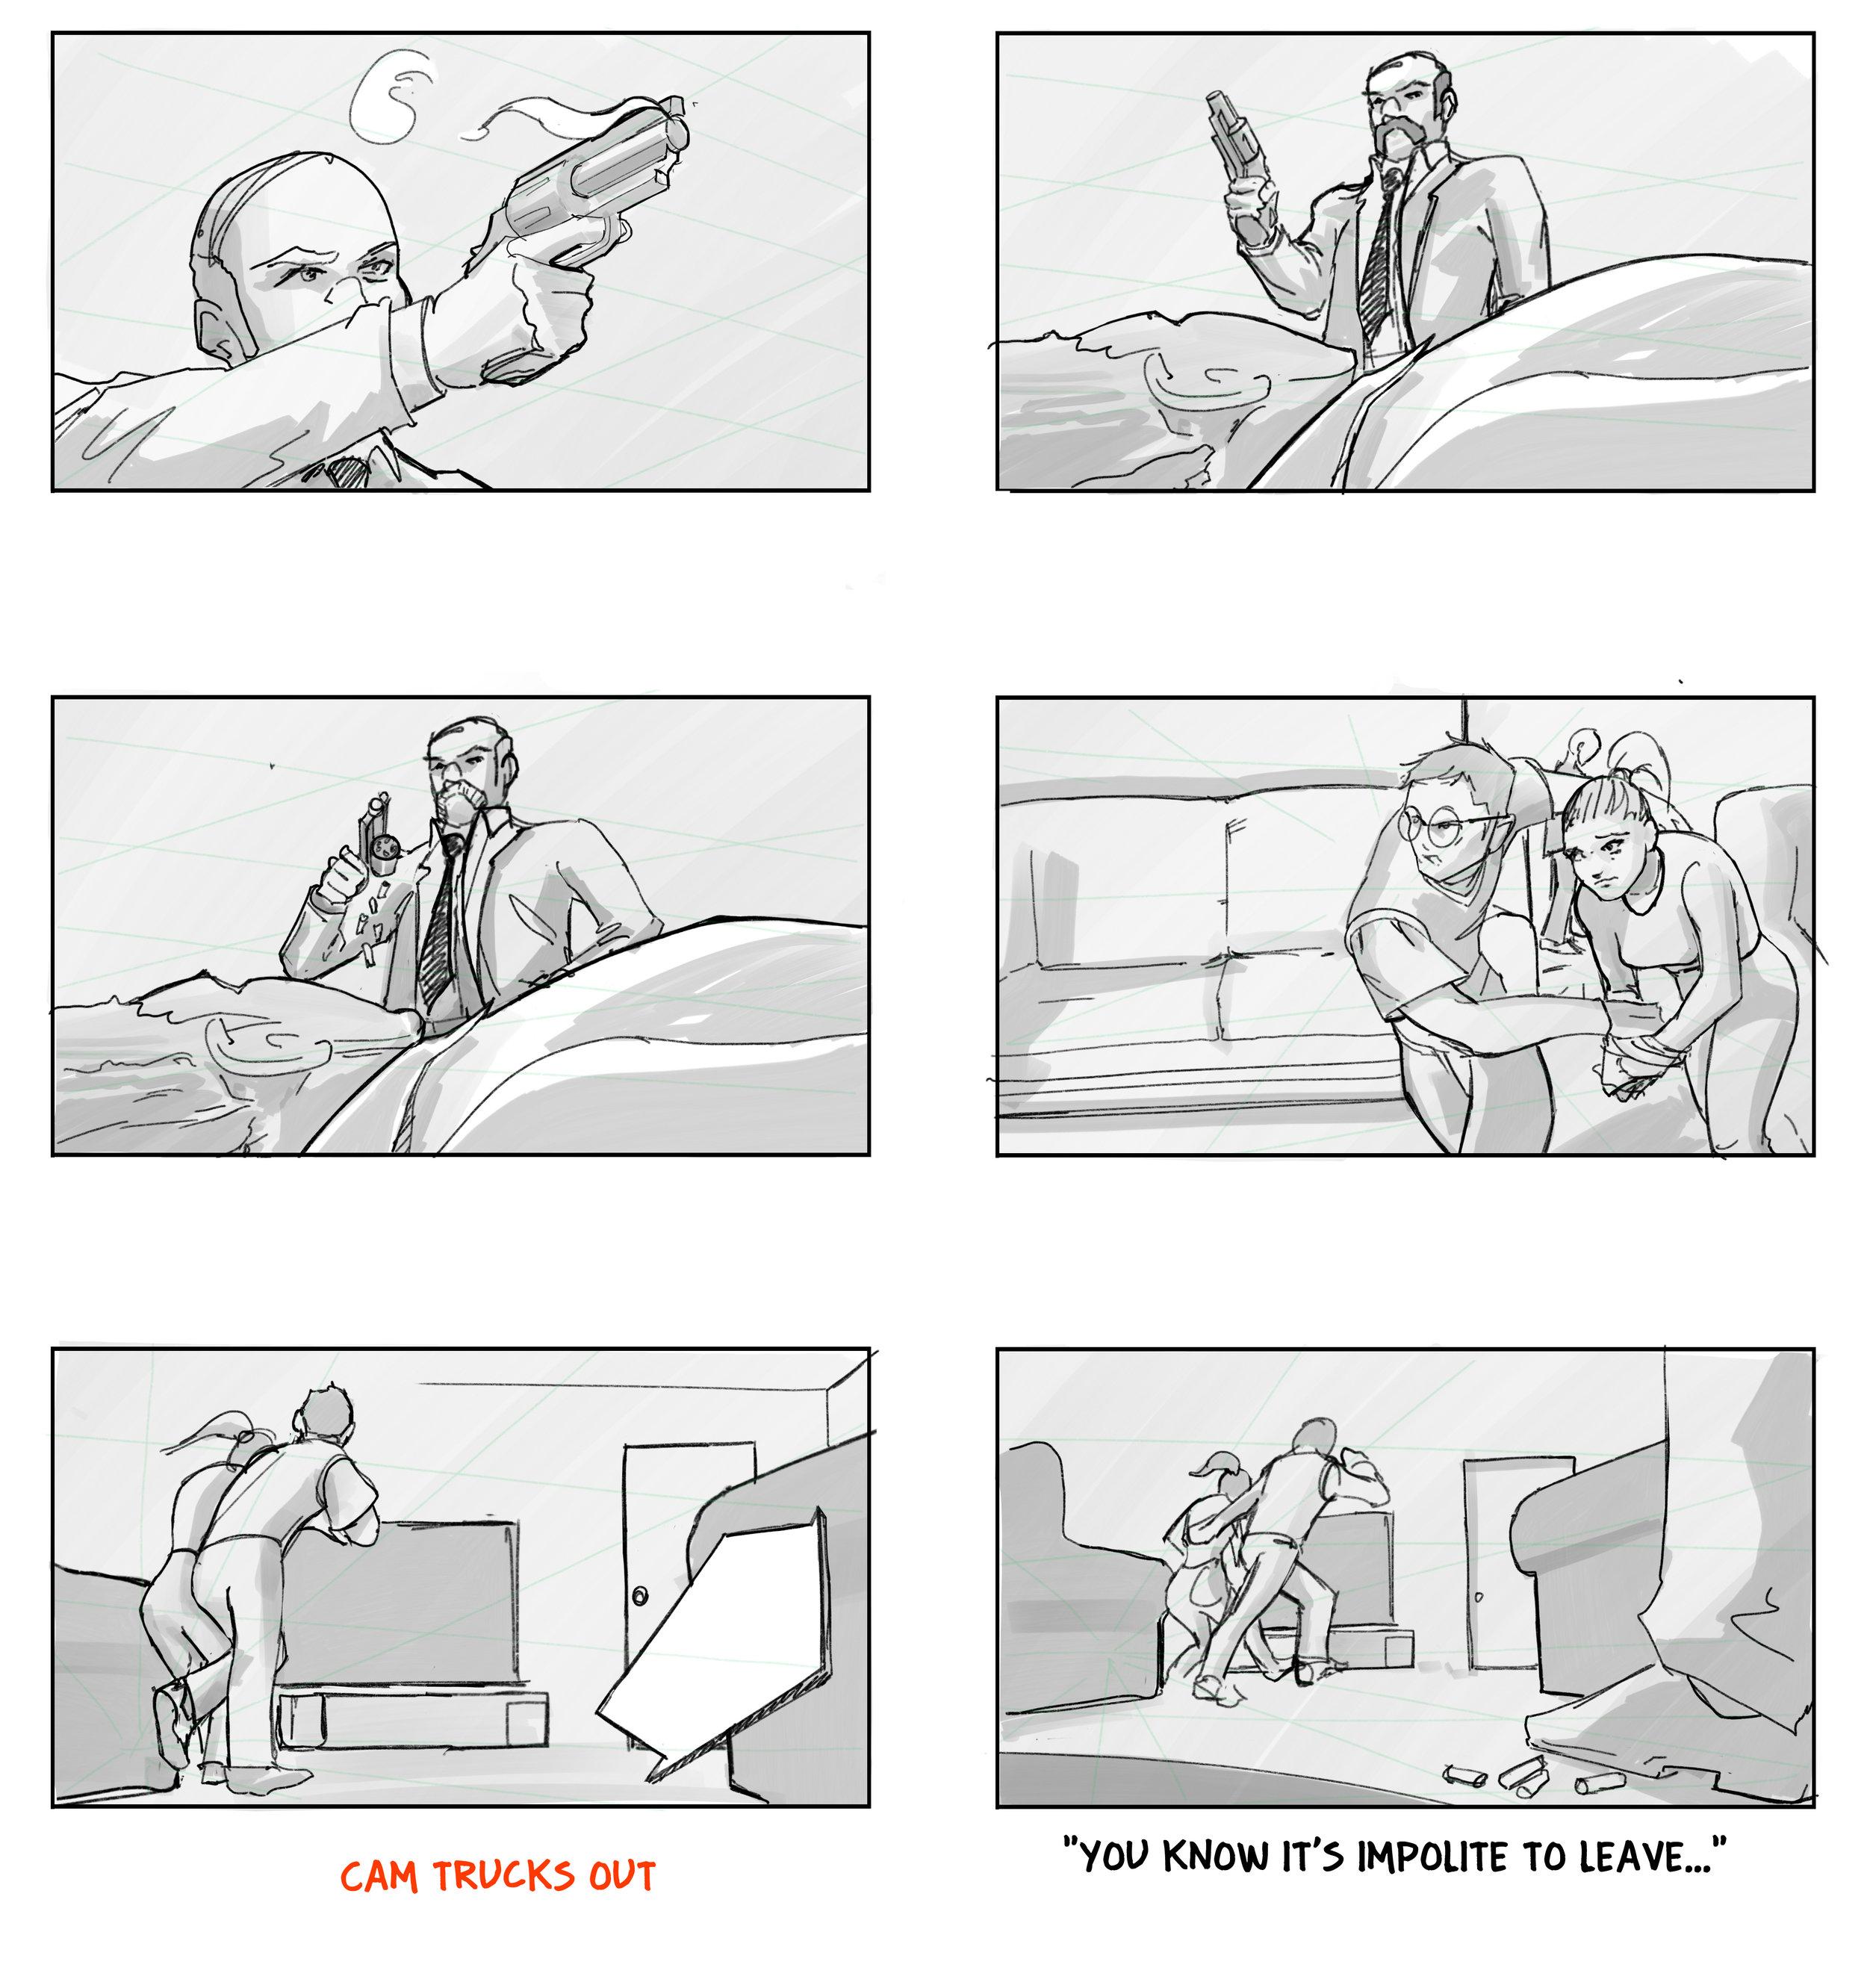 SAM_BS_Catapano_Storyboards_015.jpg